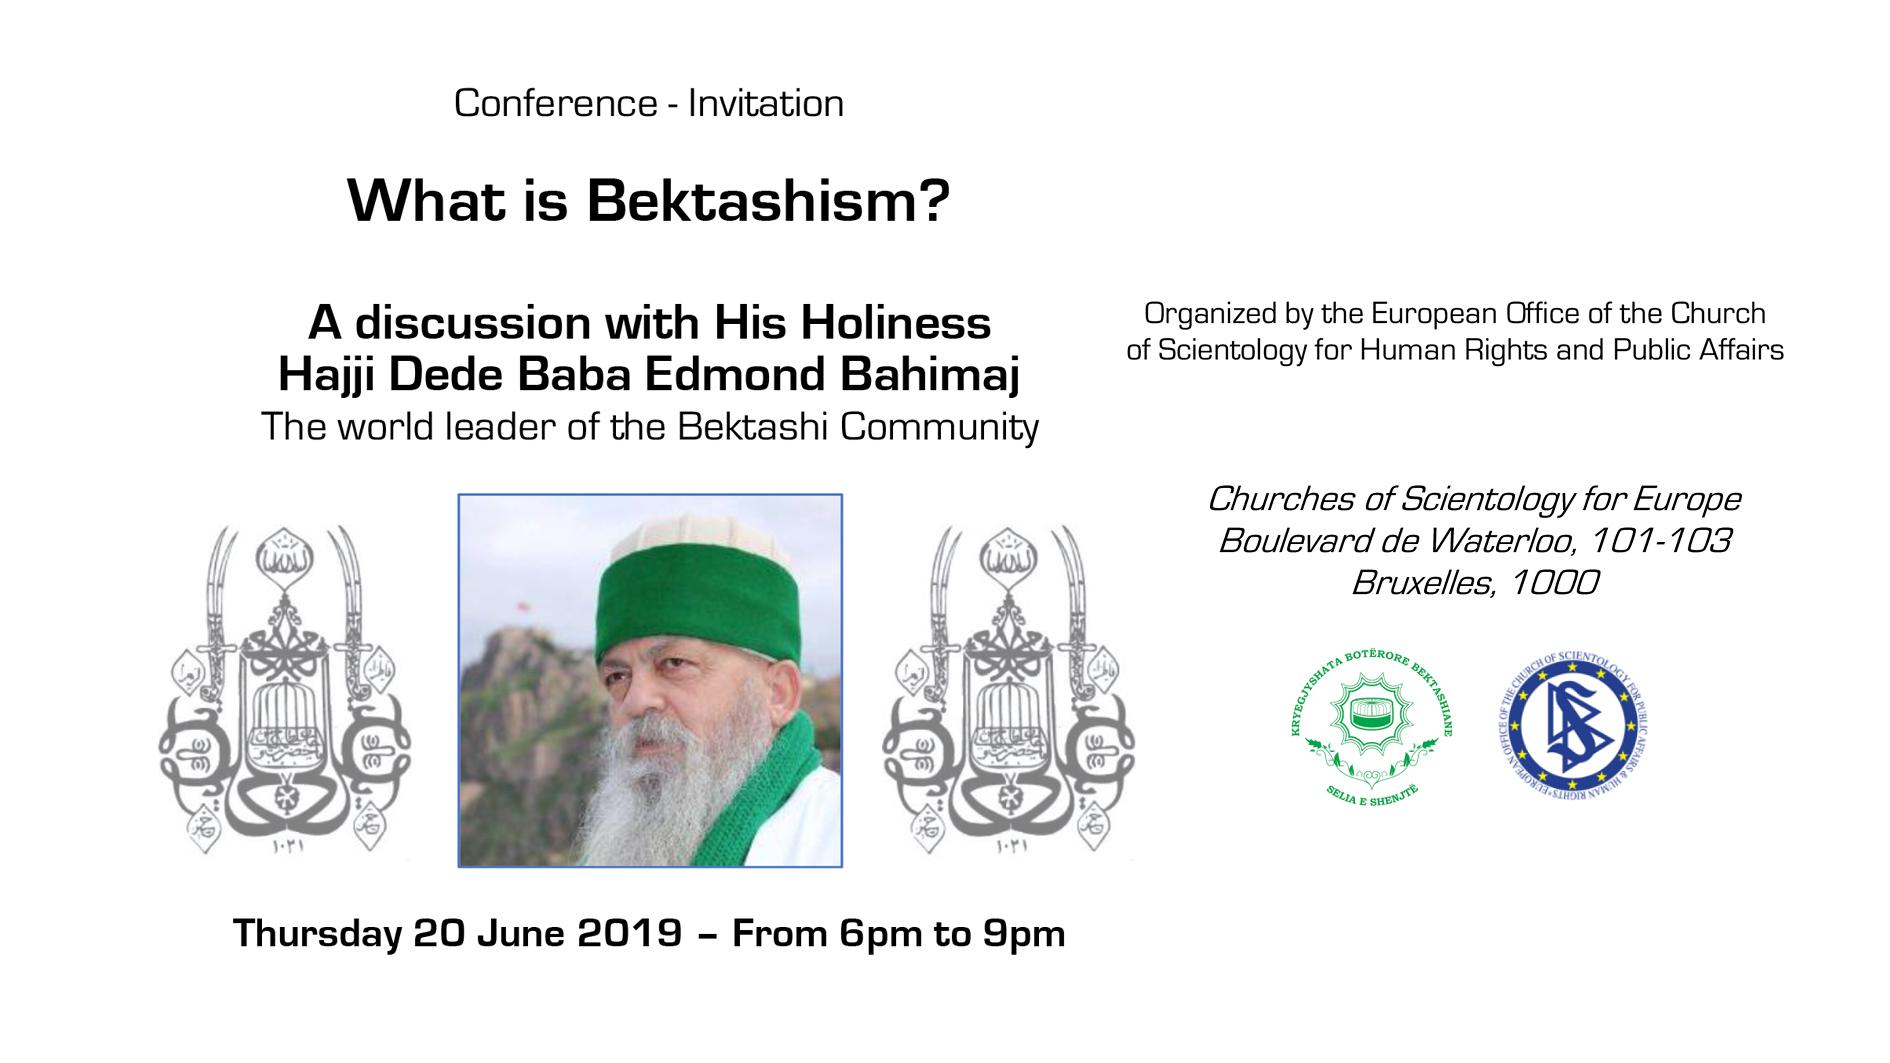 Conference: What is Bektashism? by His Holiness Hajji Dede Baba Edmond Bahimaj 🗓 🗺